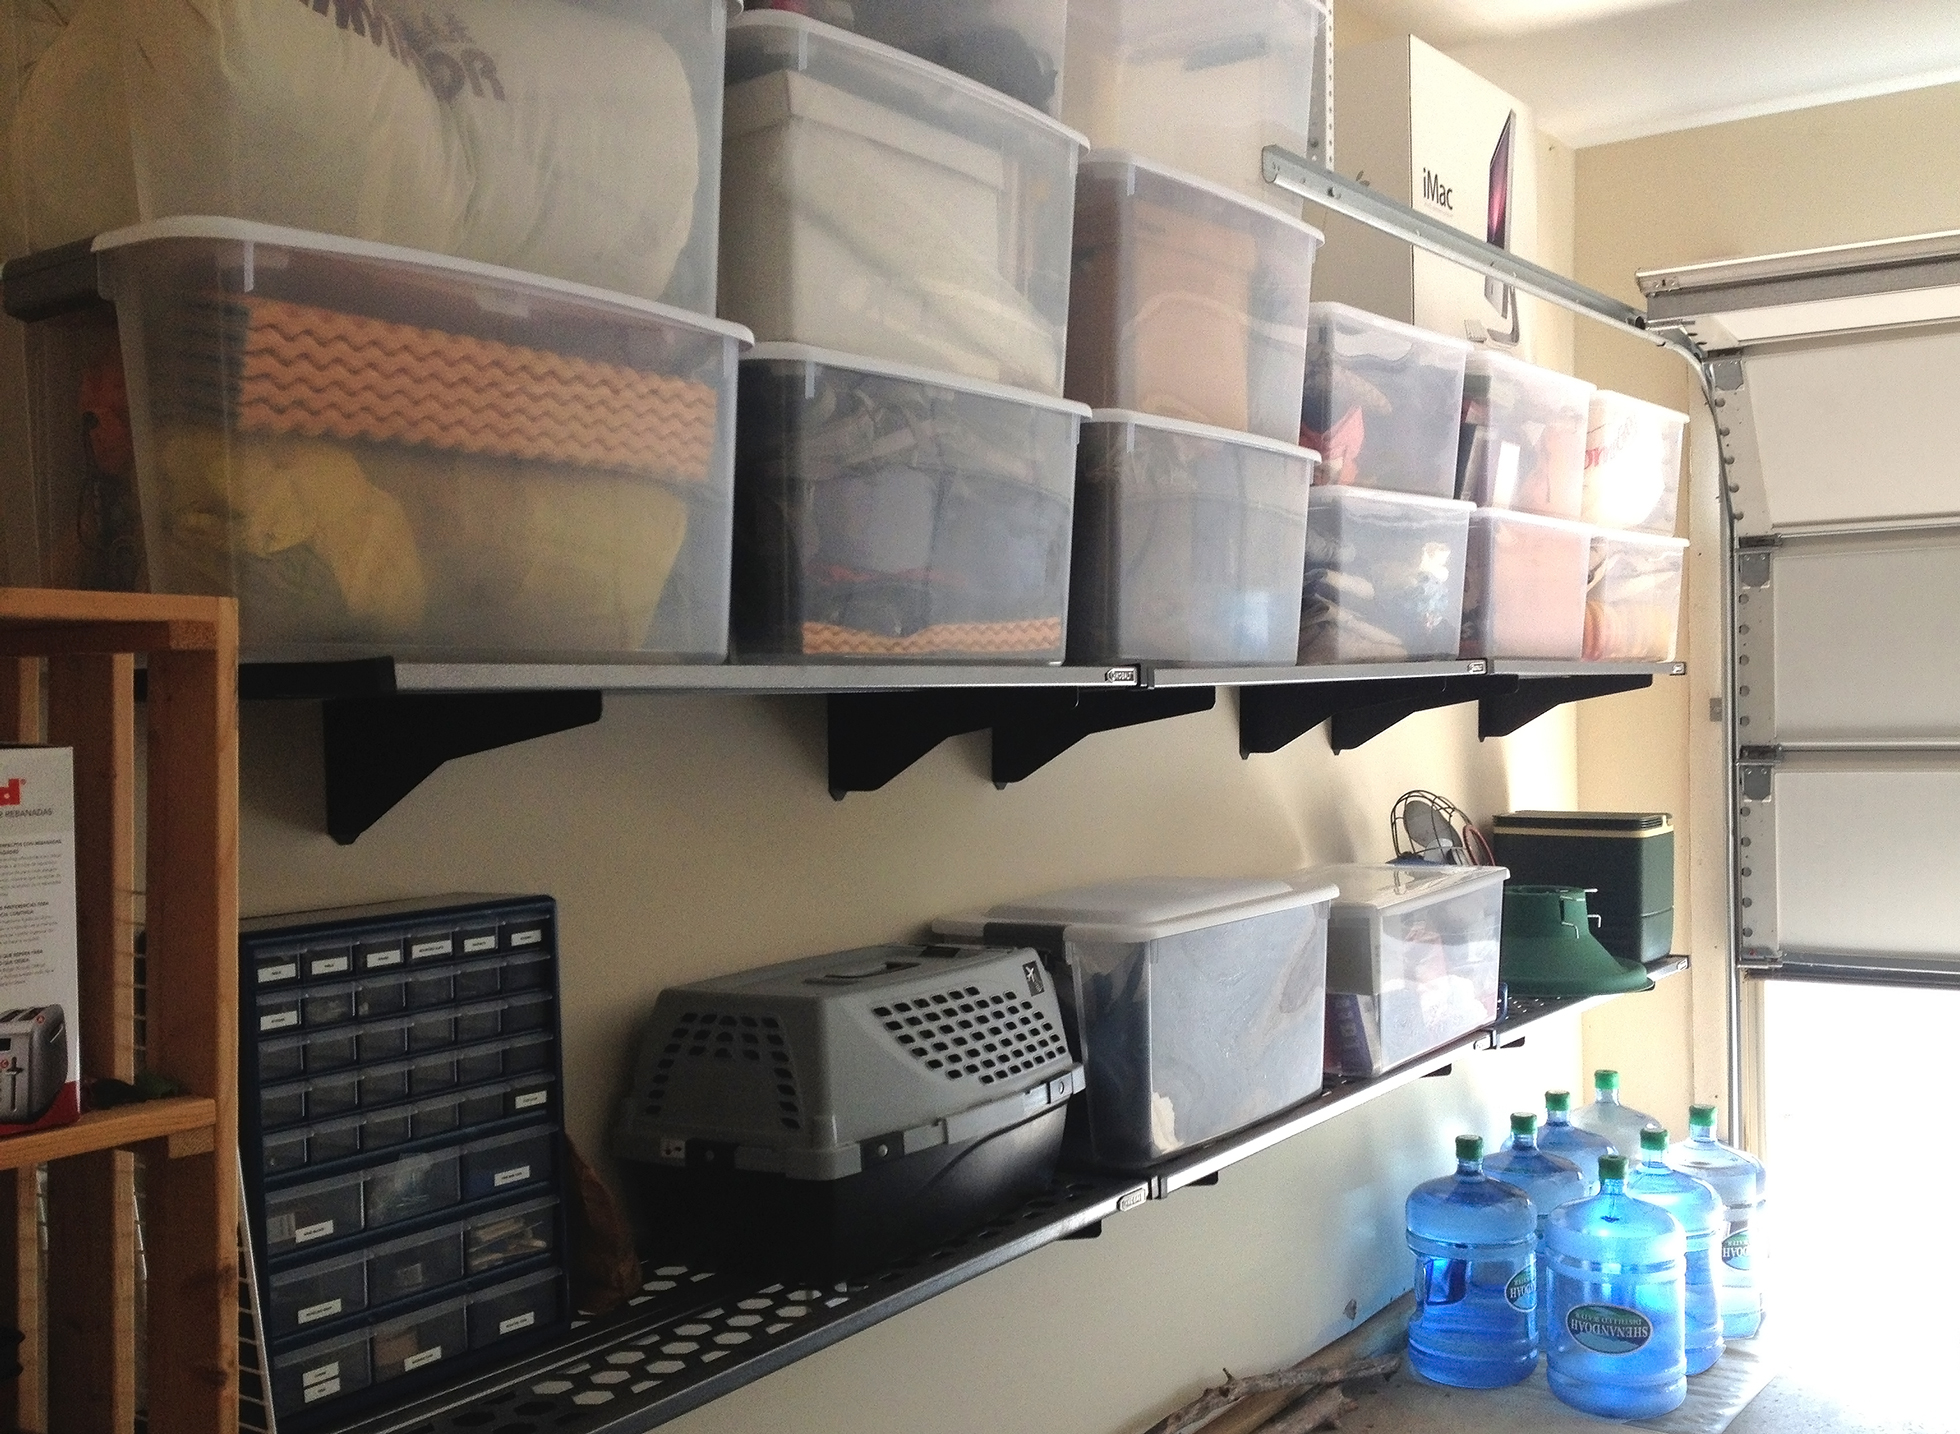 Home Remodeling Tips | Home Remodel Tips | Remodel Tips